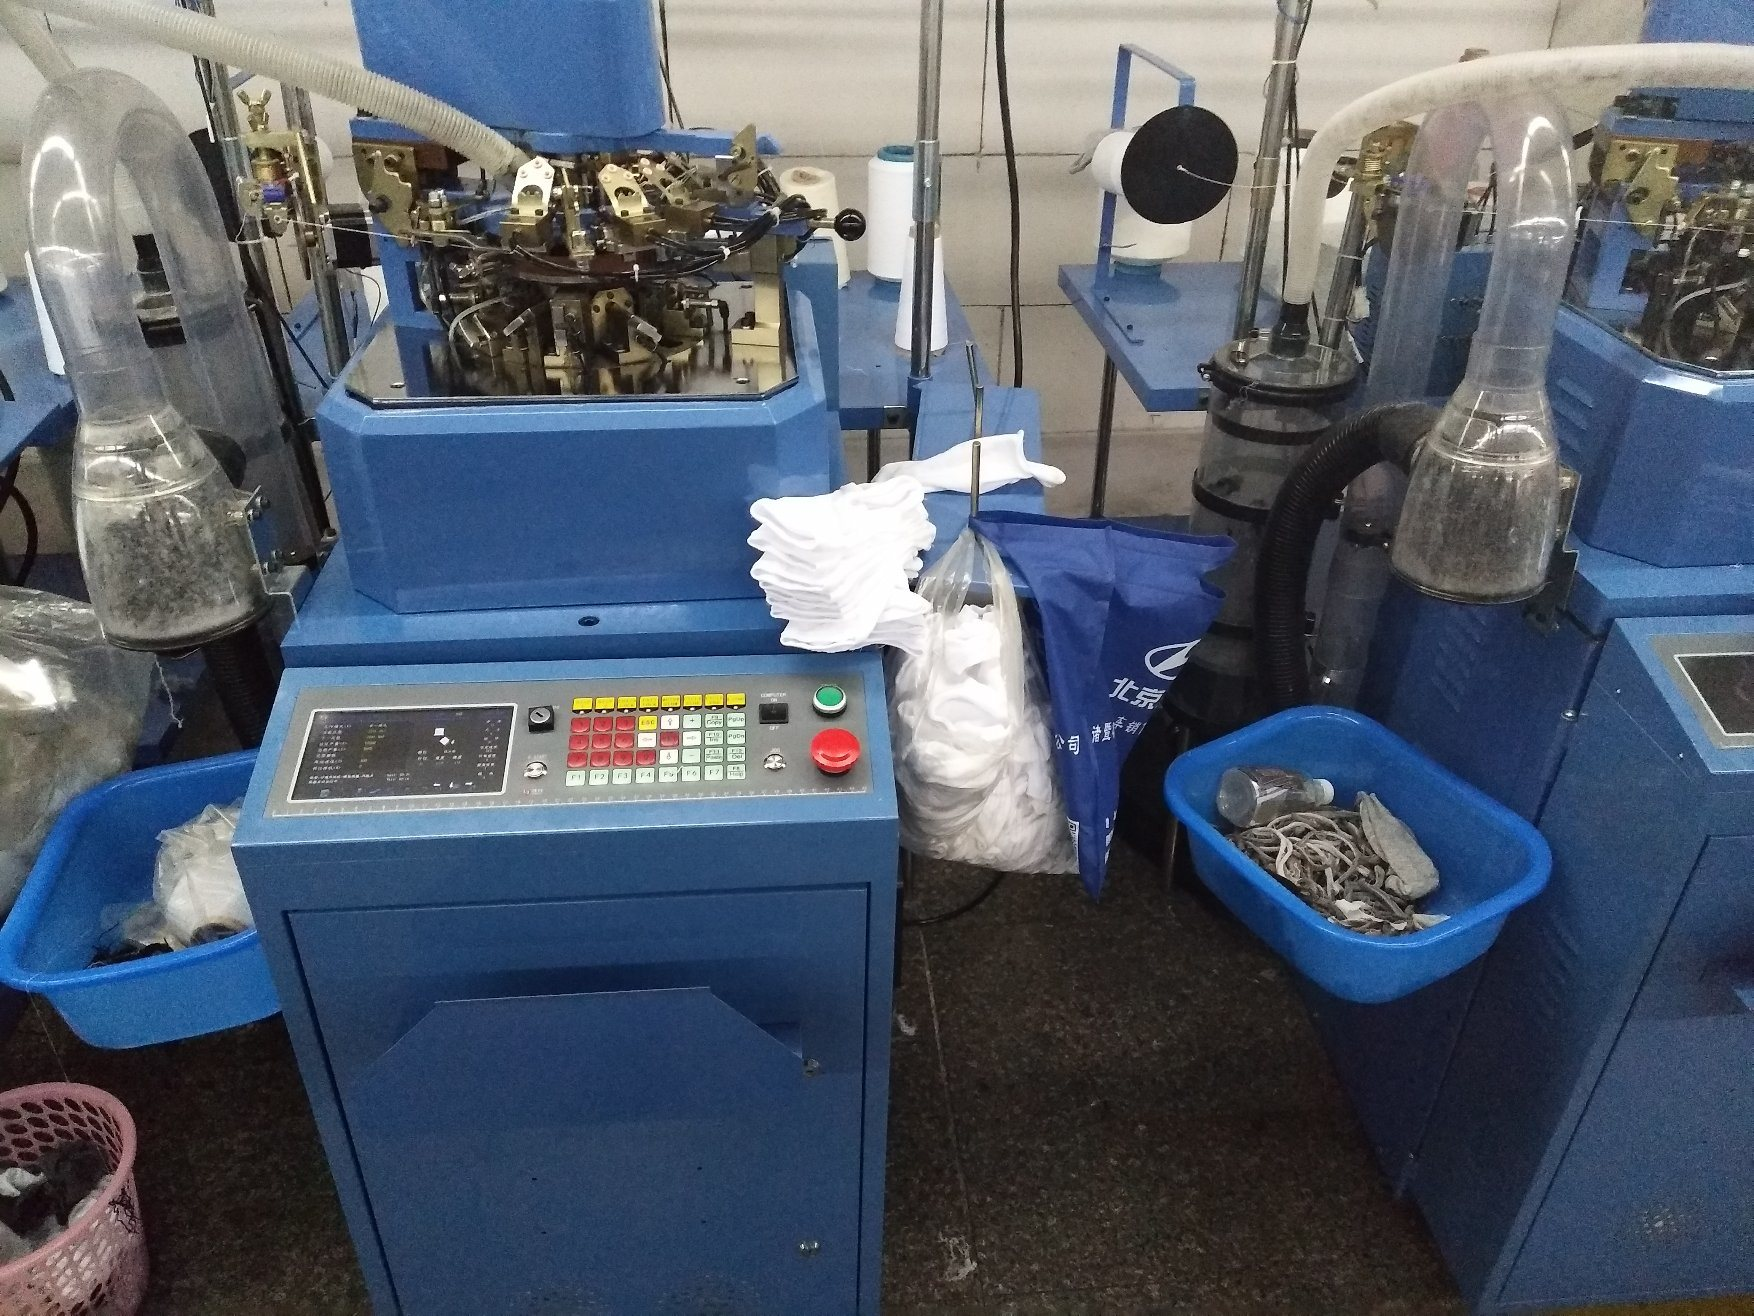 Hys-PT3.75-6f-168n Plain&Terry Mix Function Socks Knitting Machine